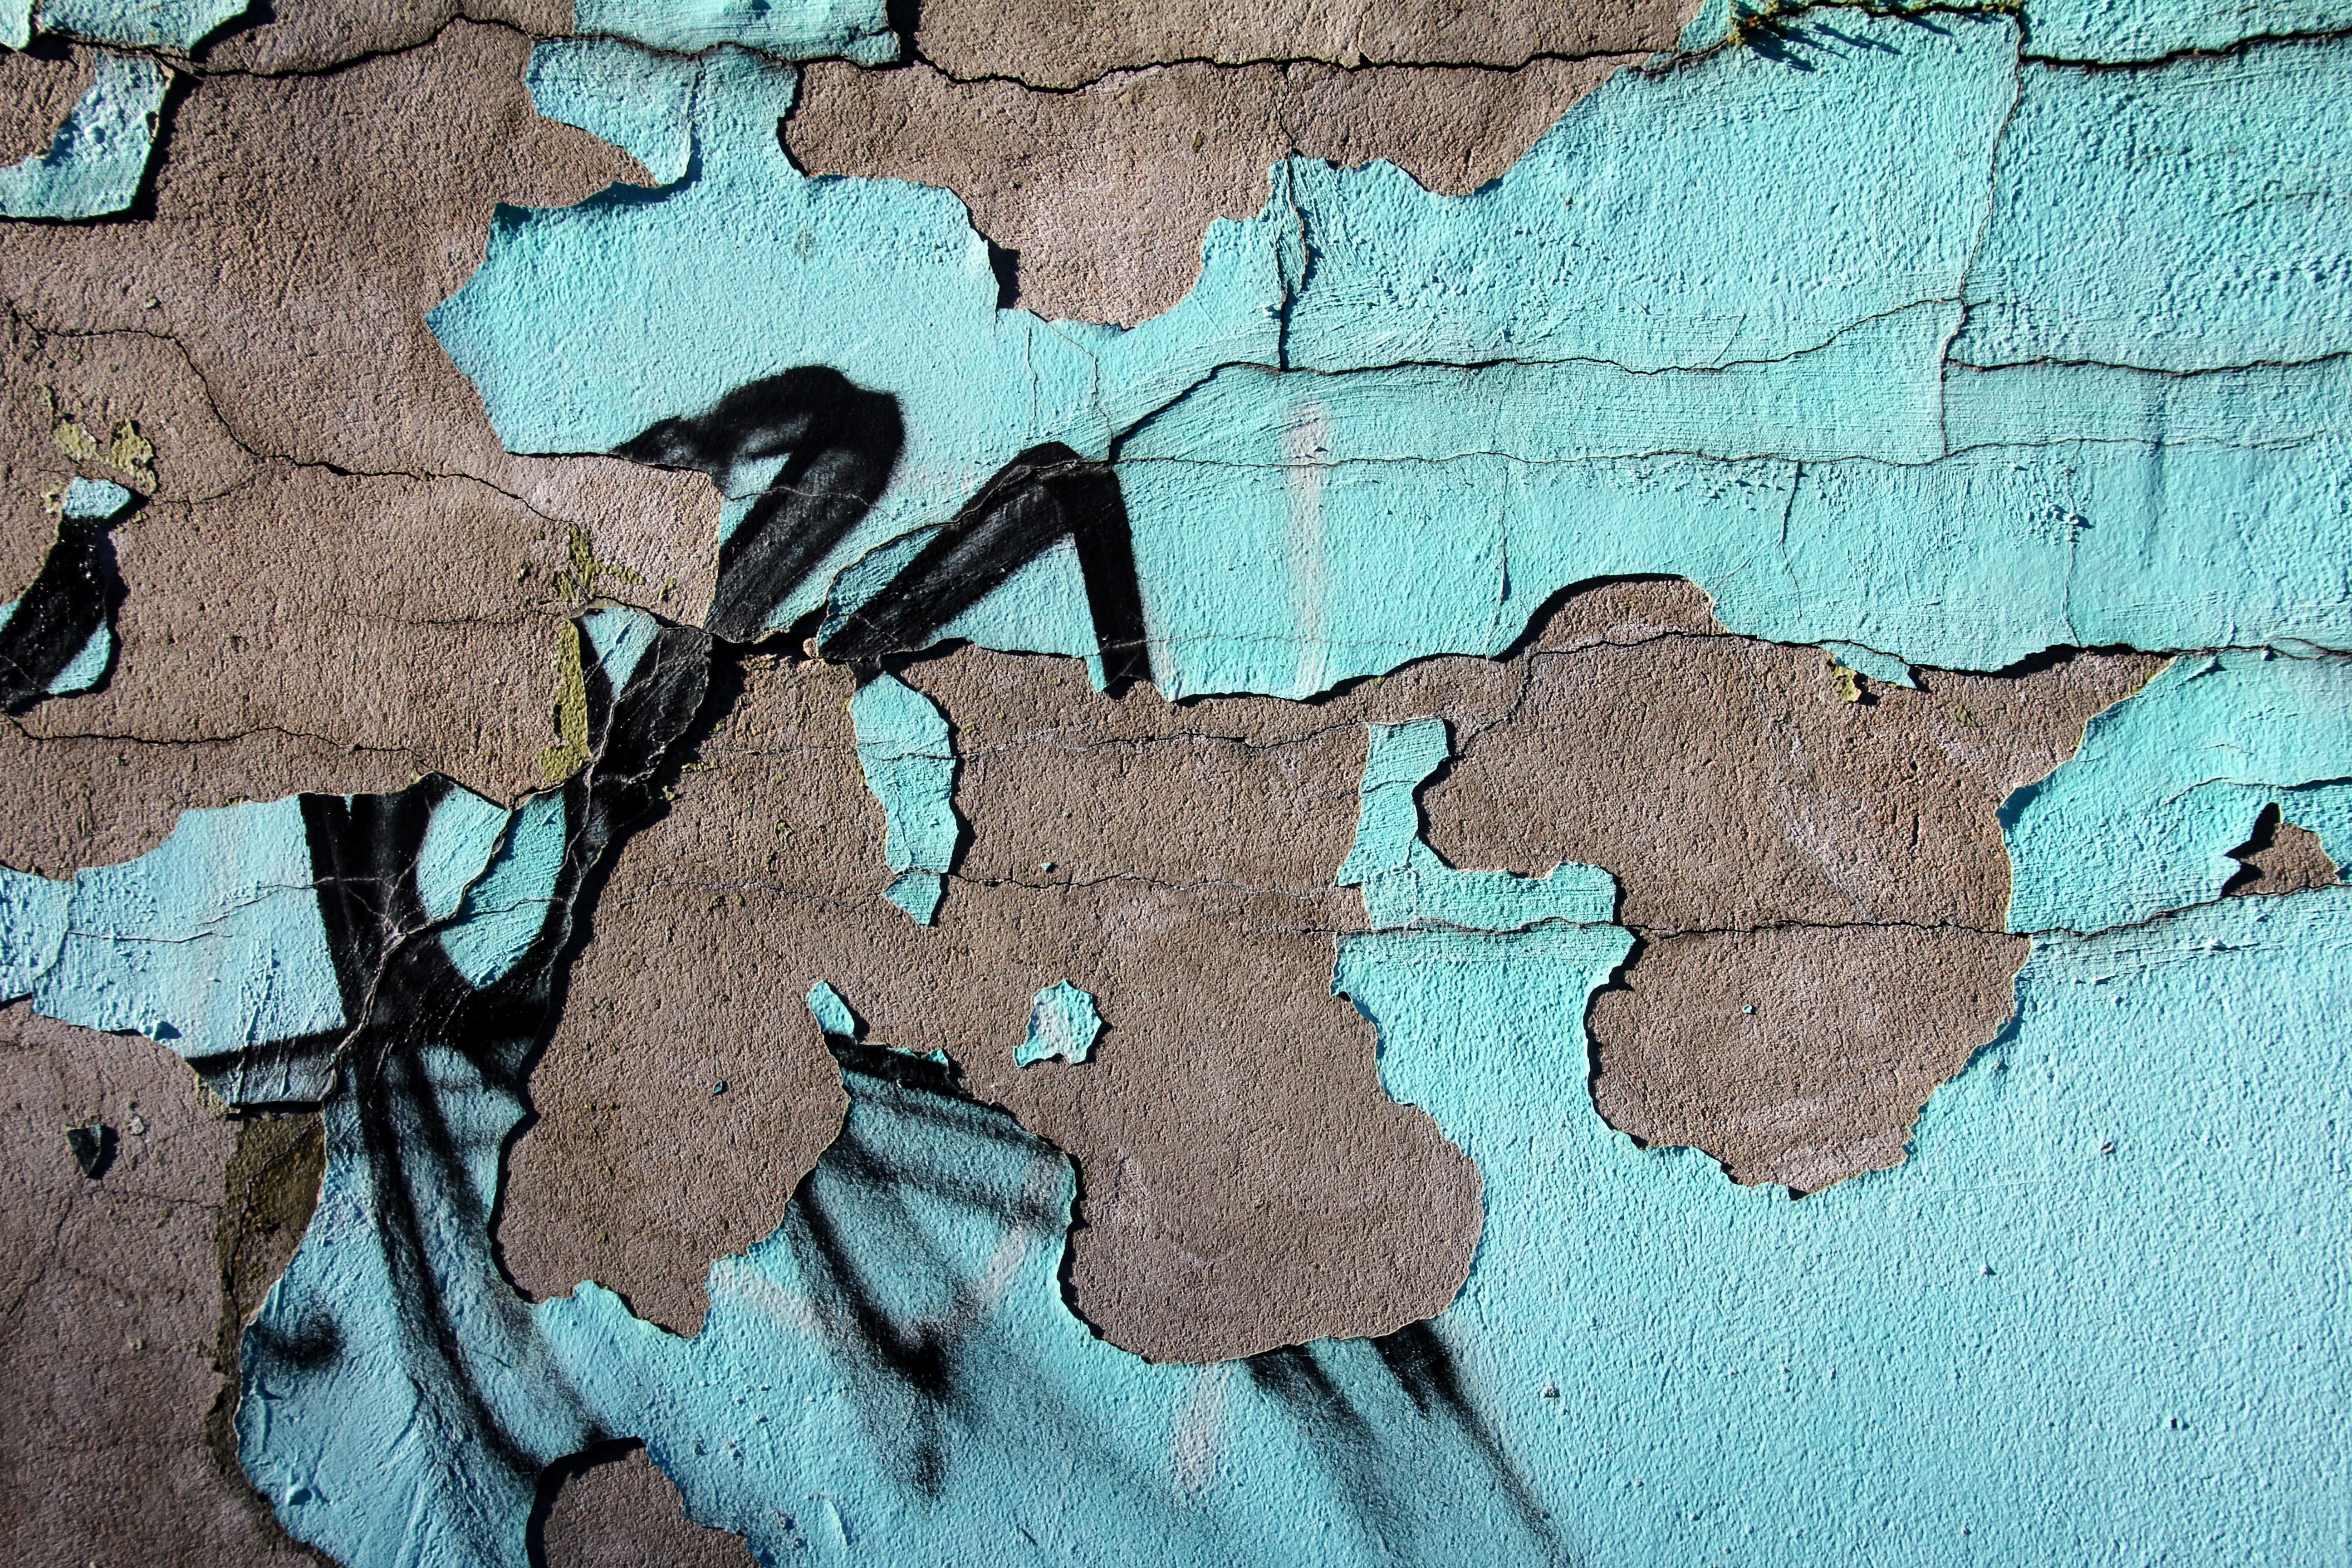 Textur Blatt Mauer Grün Sprühen Farbe Boden Blau Graffiti Kunst Gips  Hausfrau Gemalte Wand